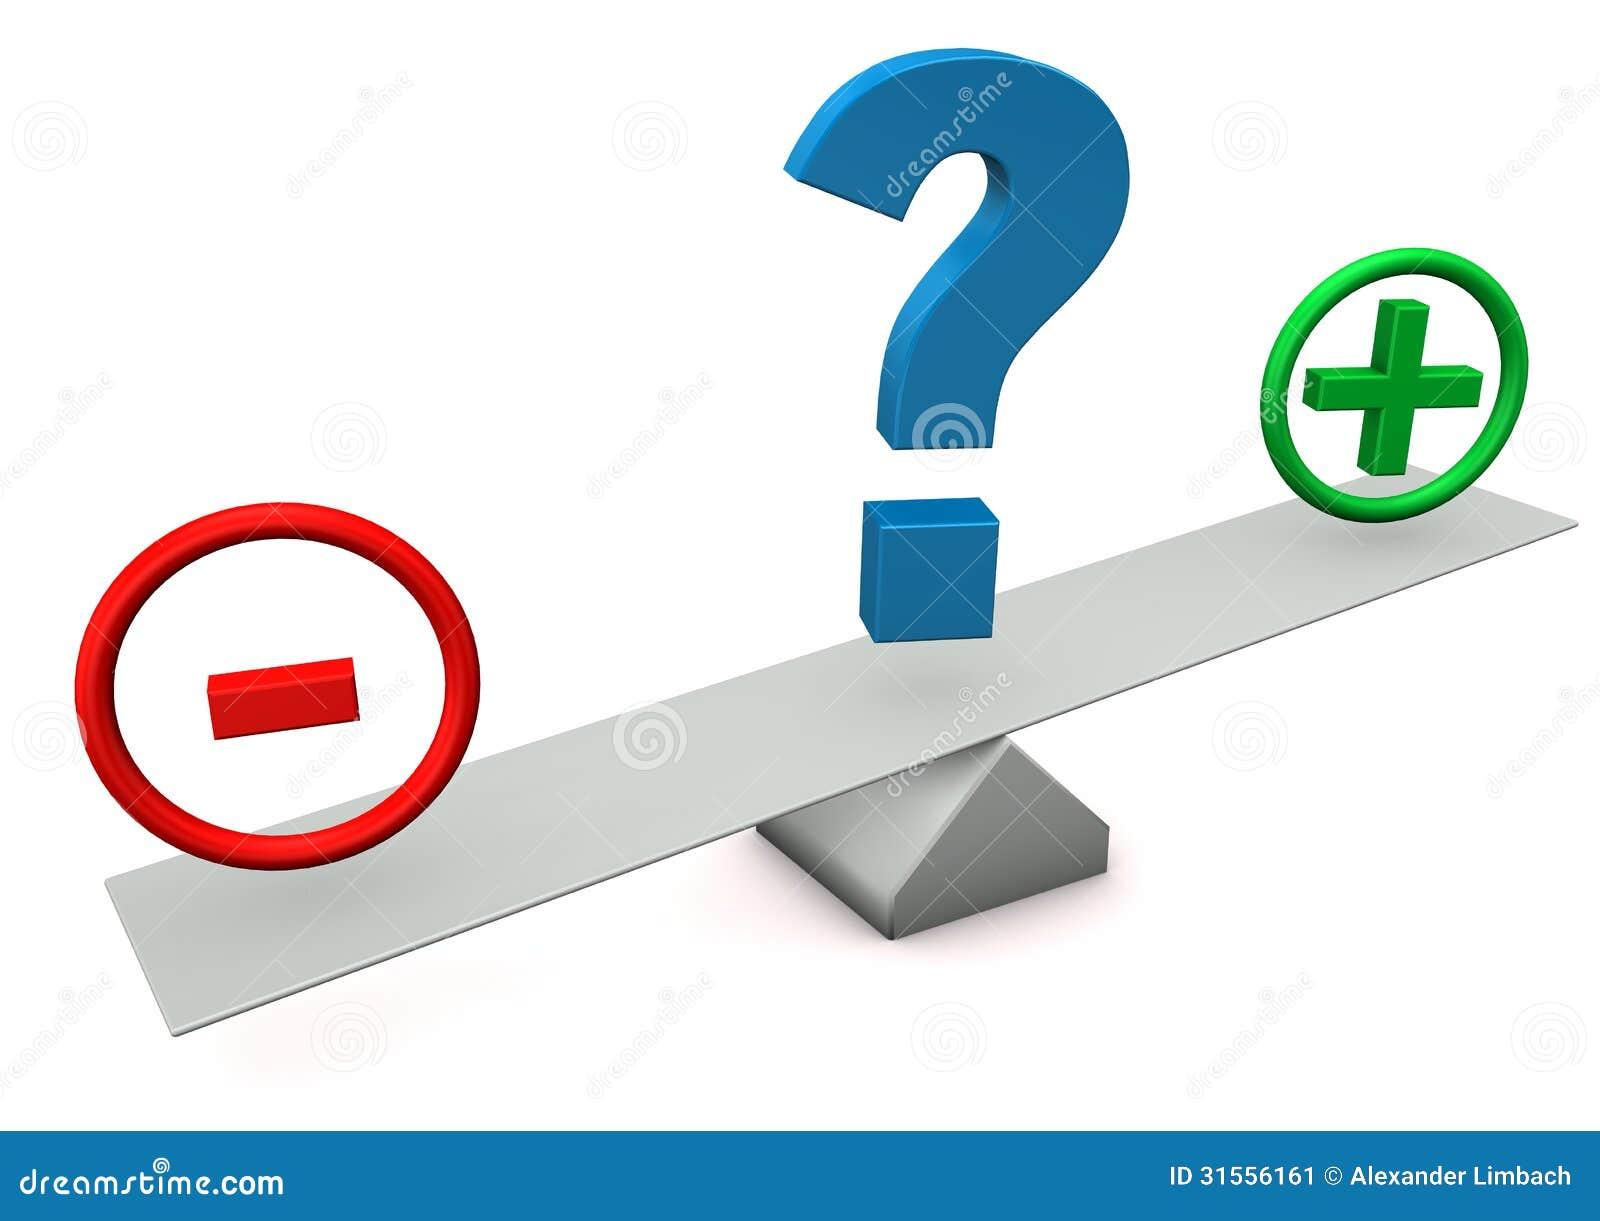 Balance plus minus stock illustration illustration of feedback plus minus question mark stock image biocorpaavc